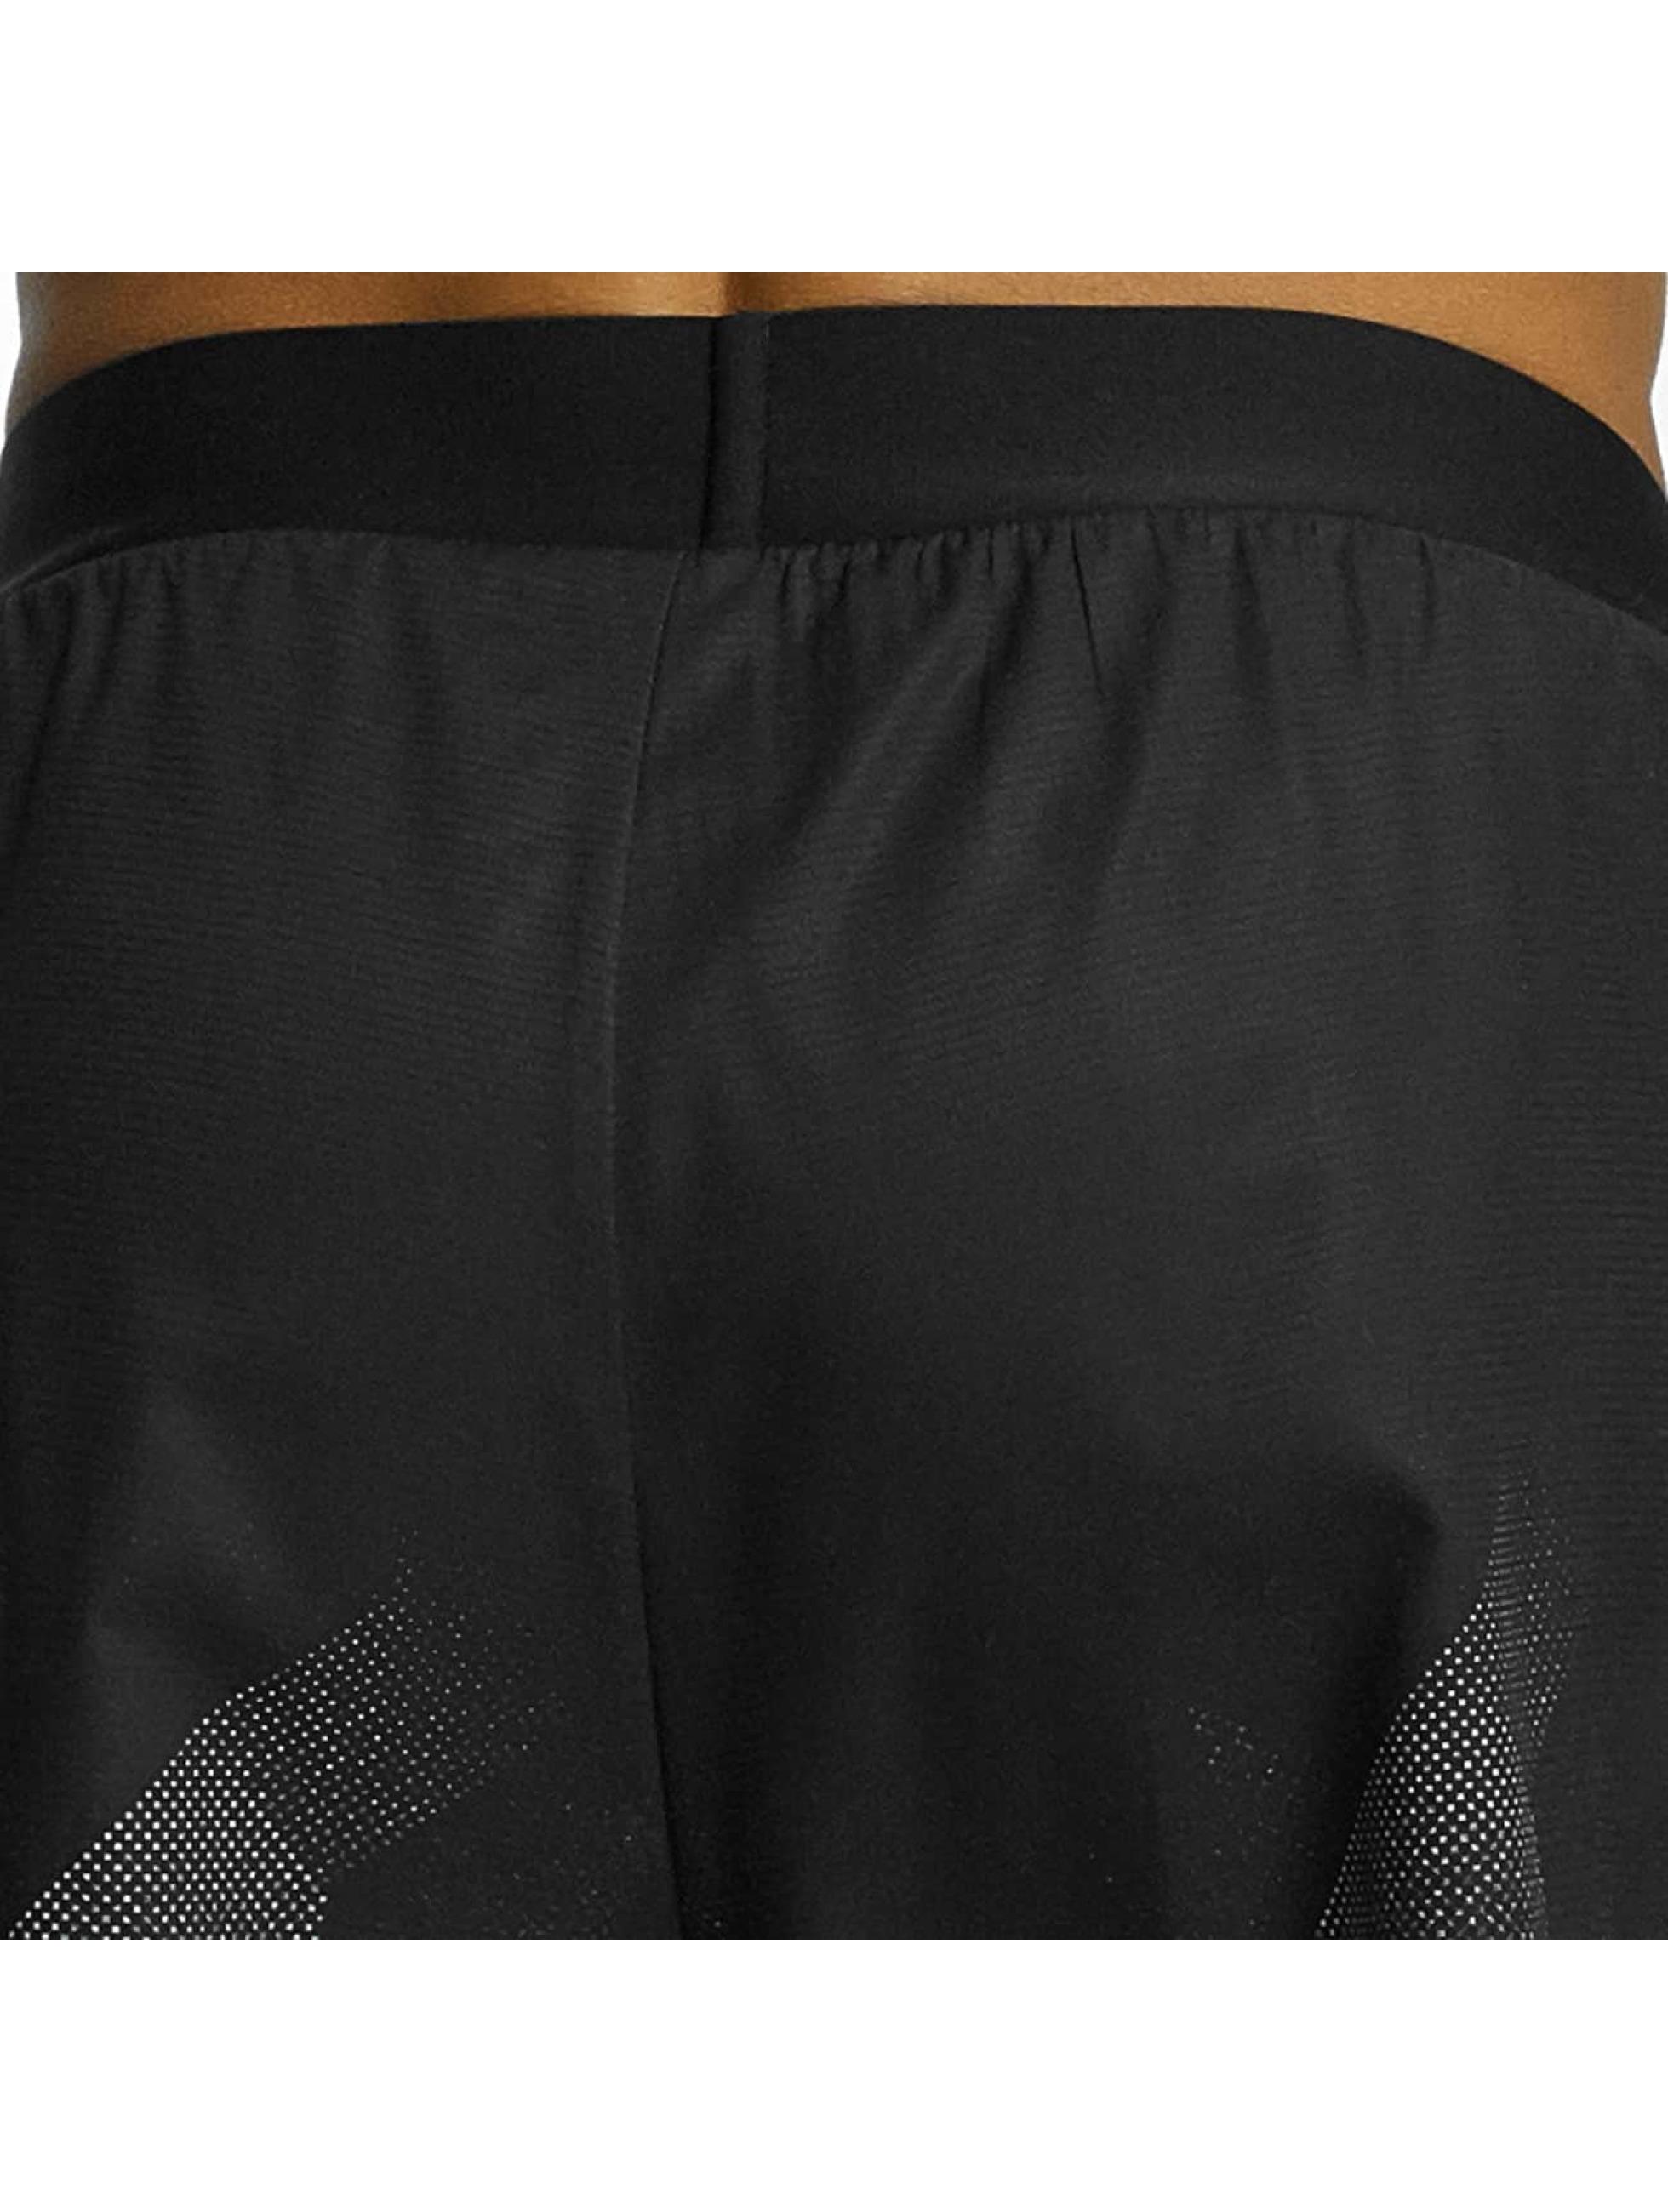 adidas Performance Shortsit Tango Future Graphic musta